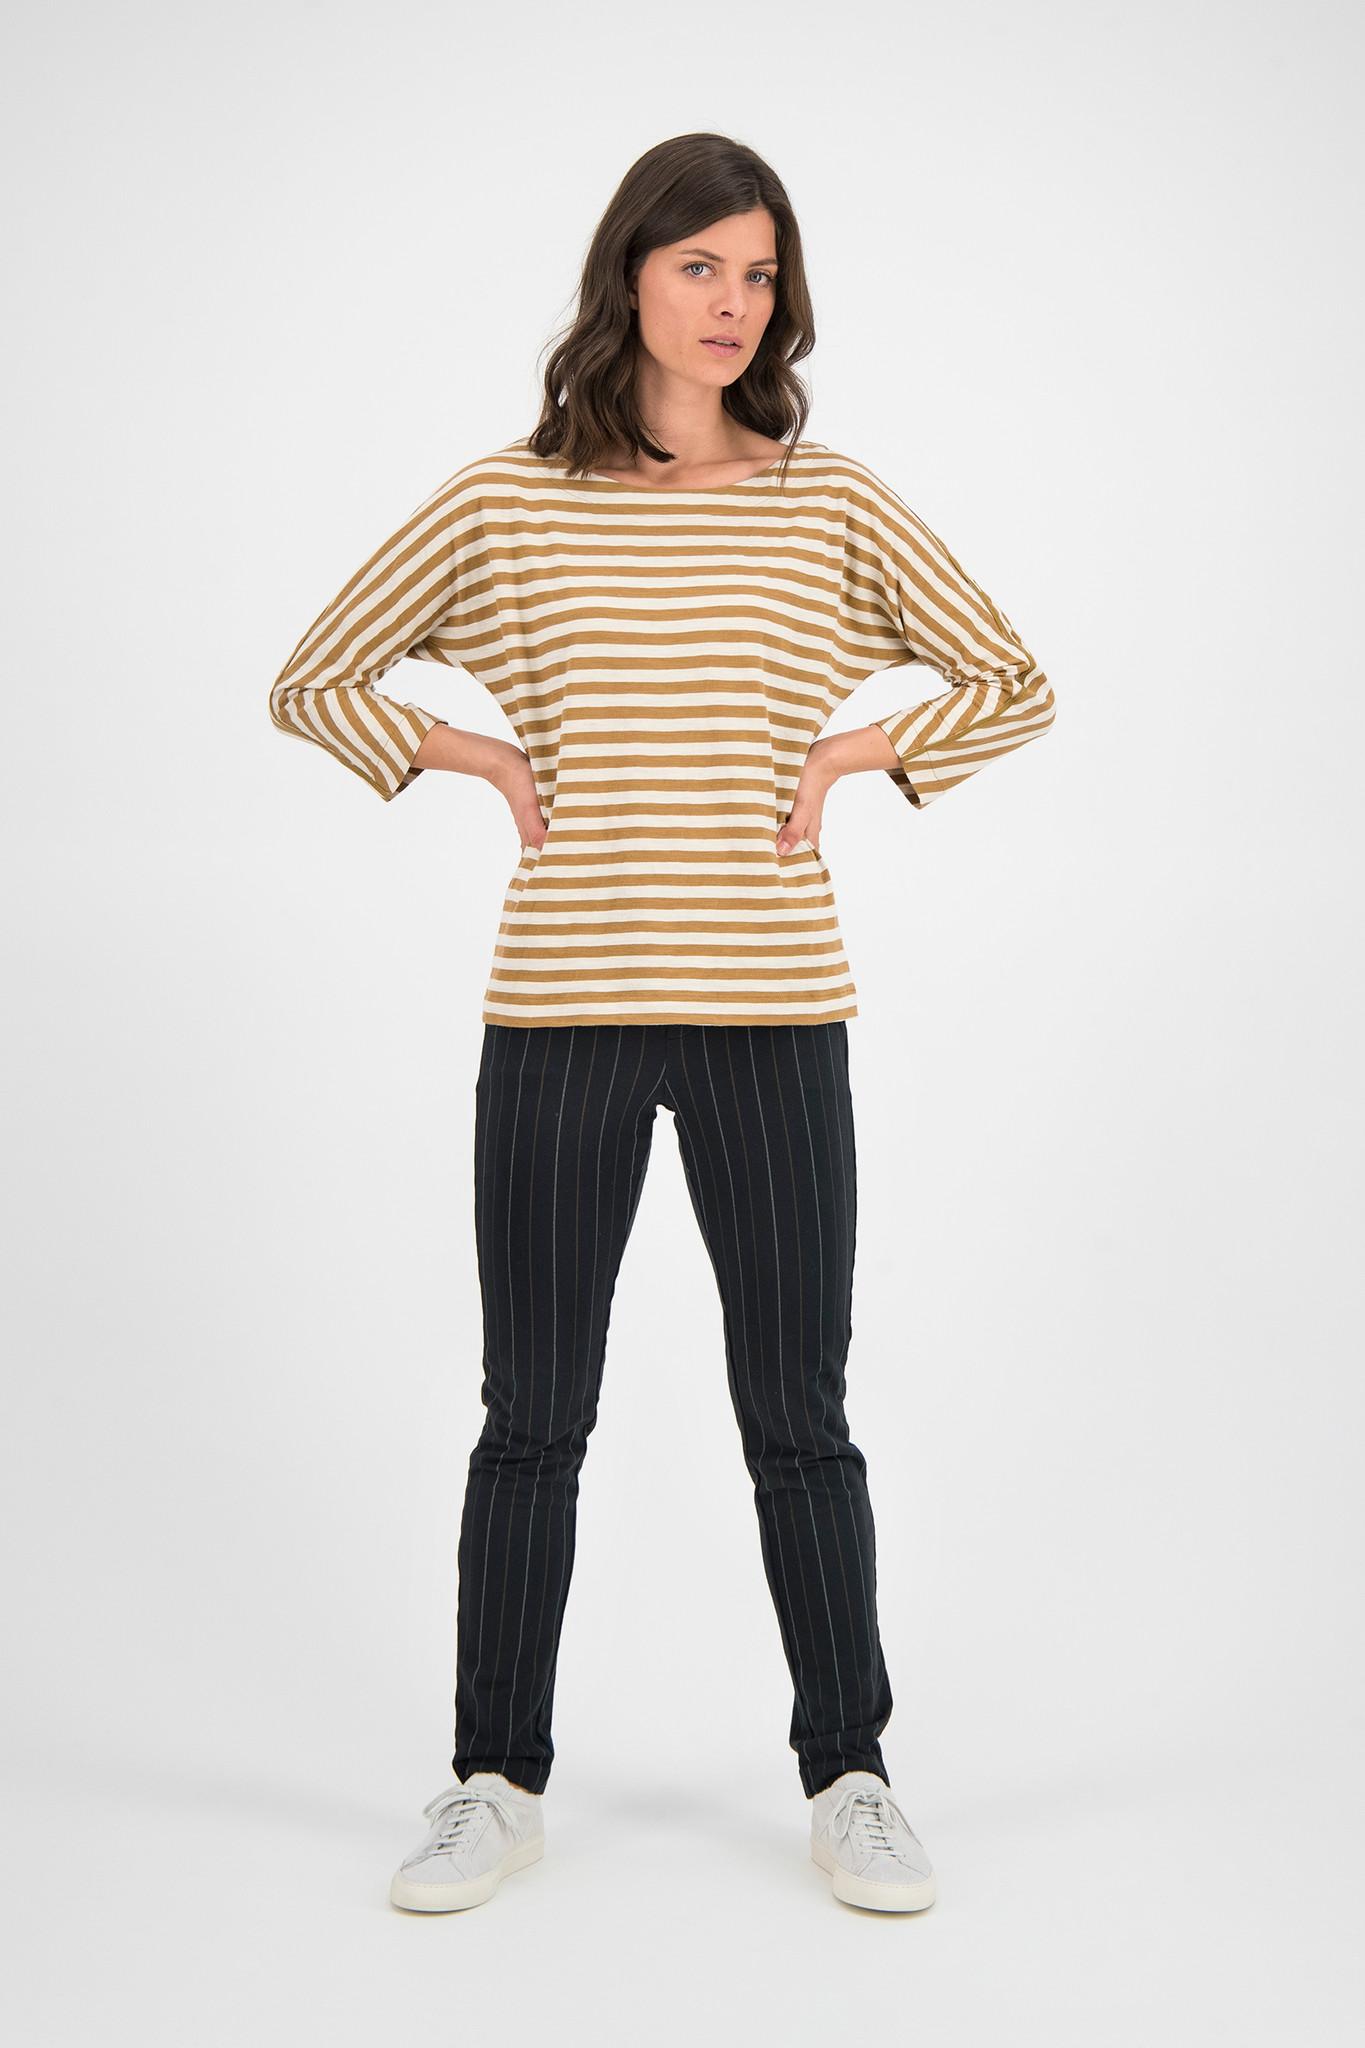 SYLVER Slub Sweat Jersey Shirt Boat-neck - Caramel